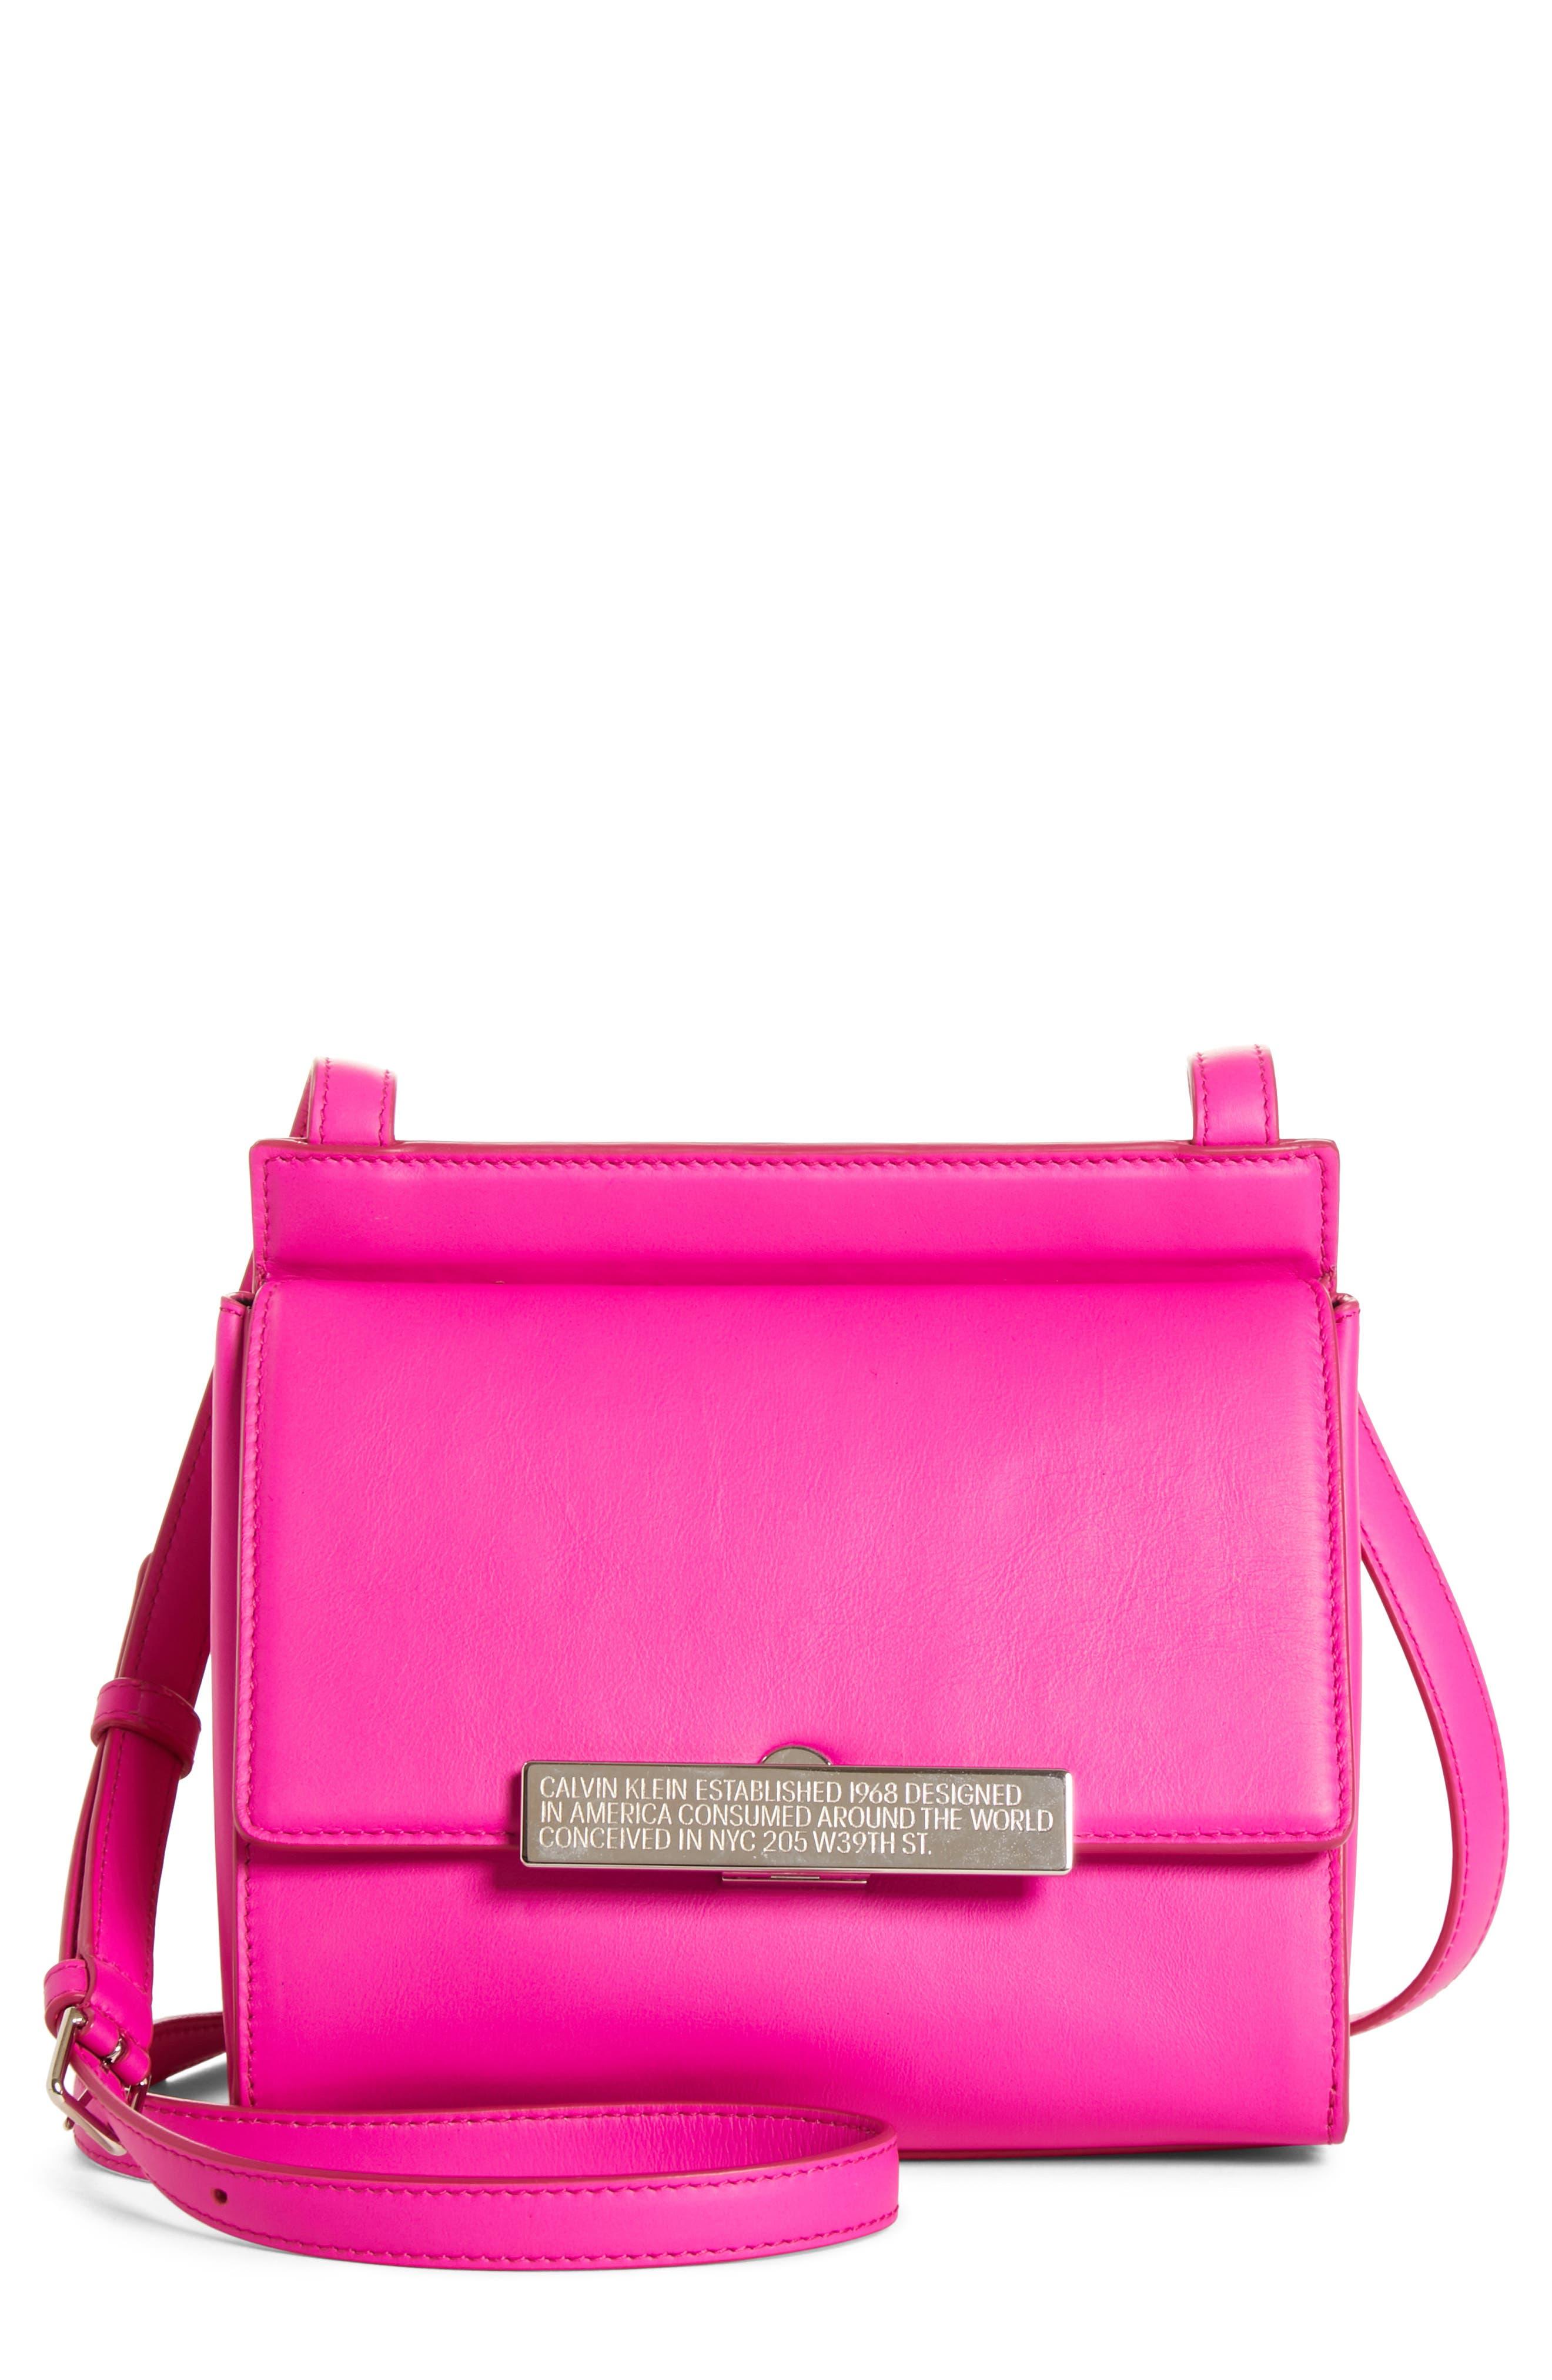 CALVIN KLEIN 205W39NYC Handbags   Wallets for Women  2a9ac96a702c1